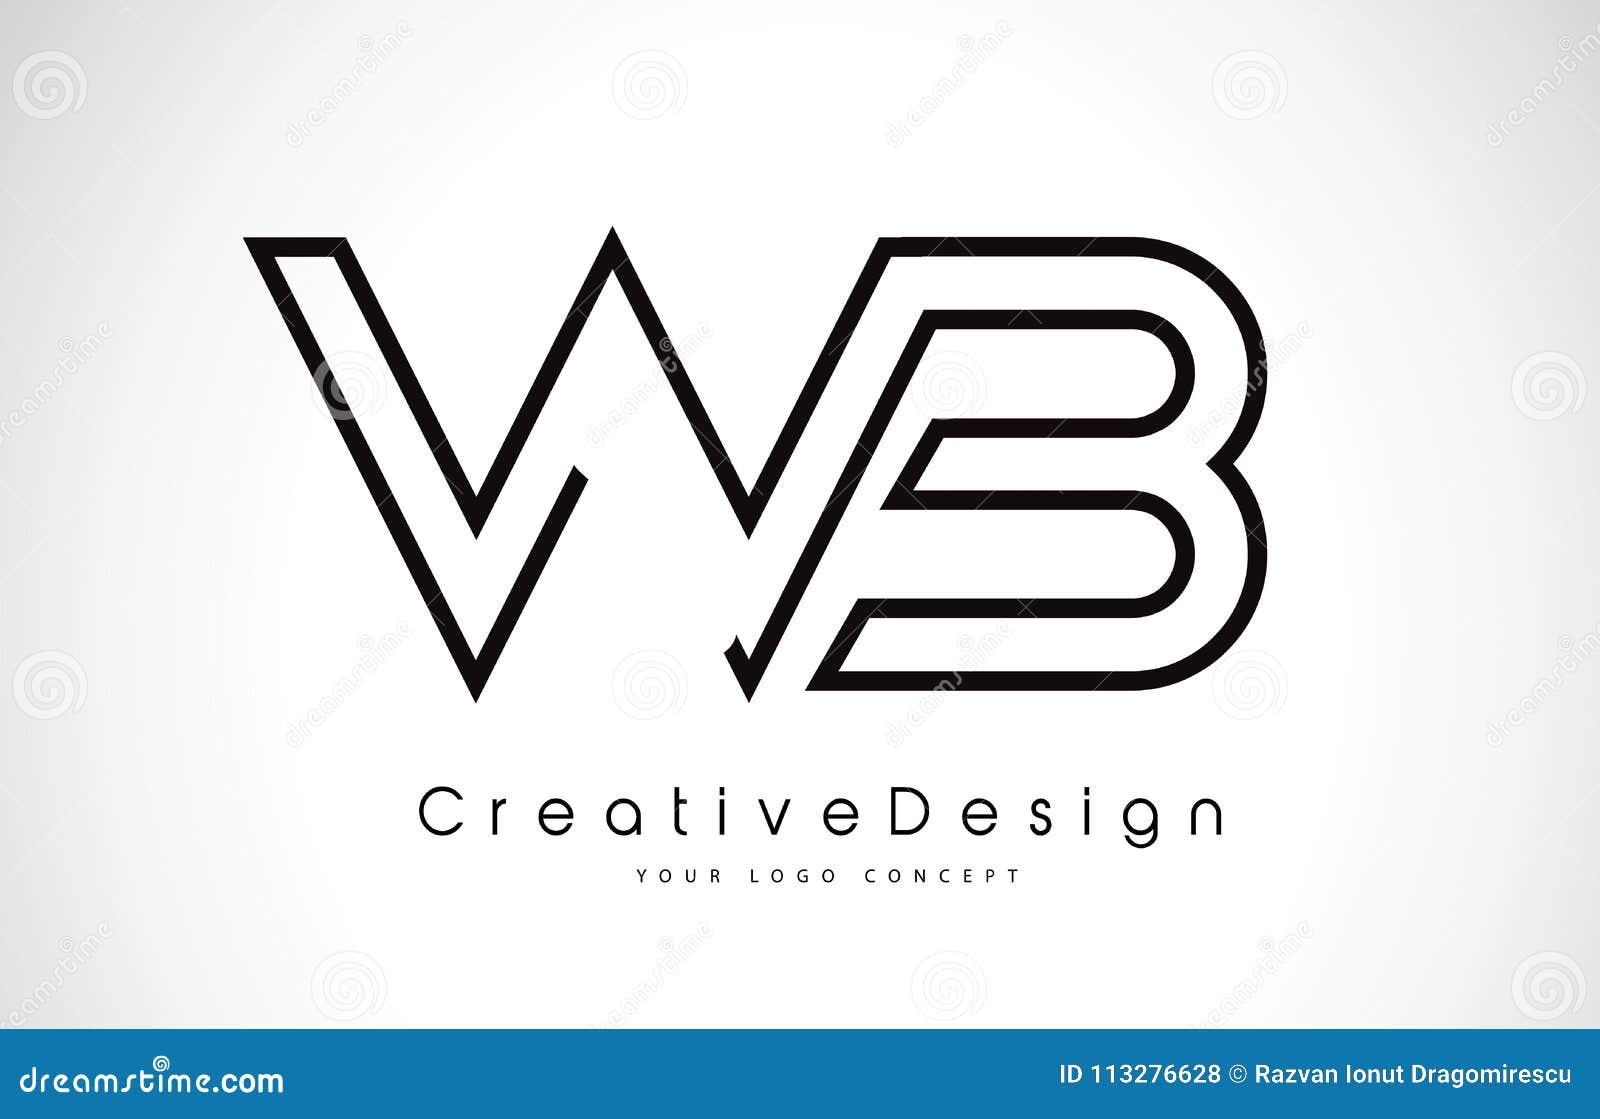 Wb W B Letter Logo Design In Black Colors Stock Illustration